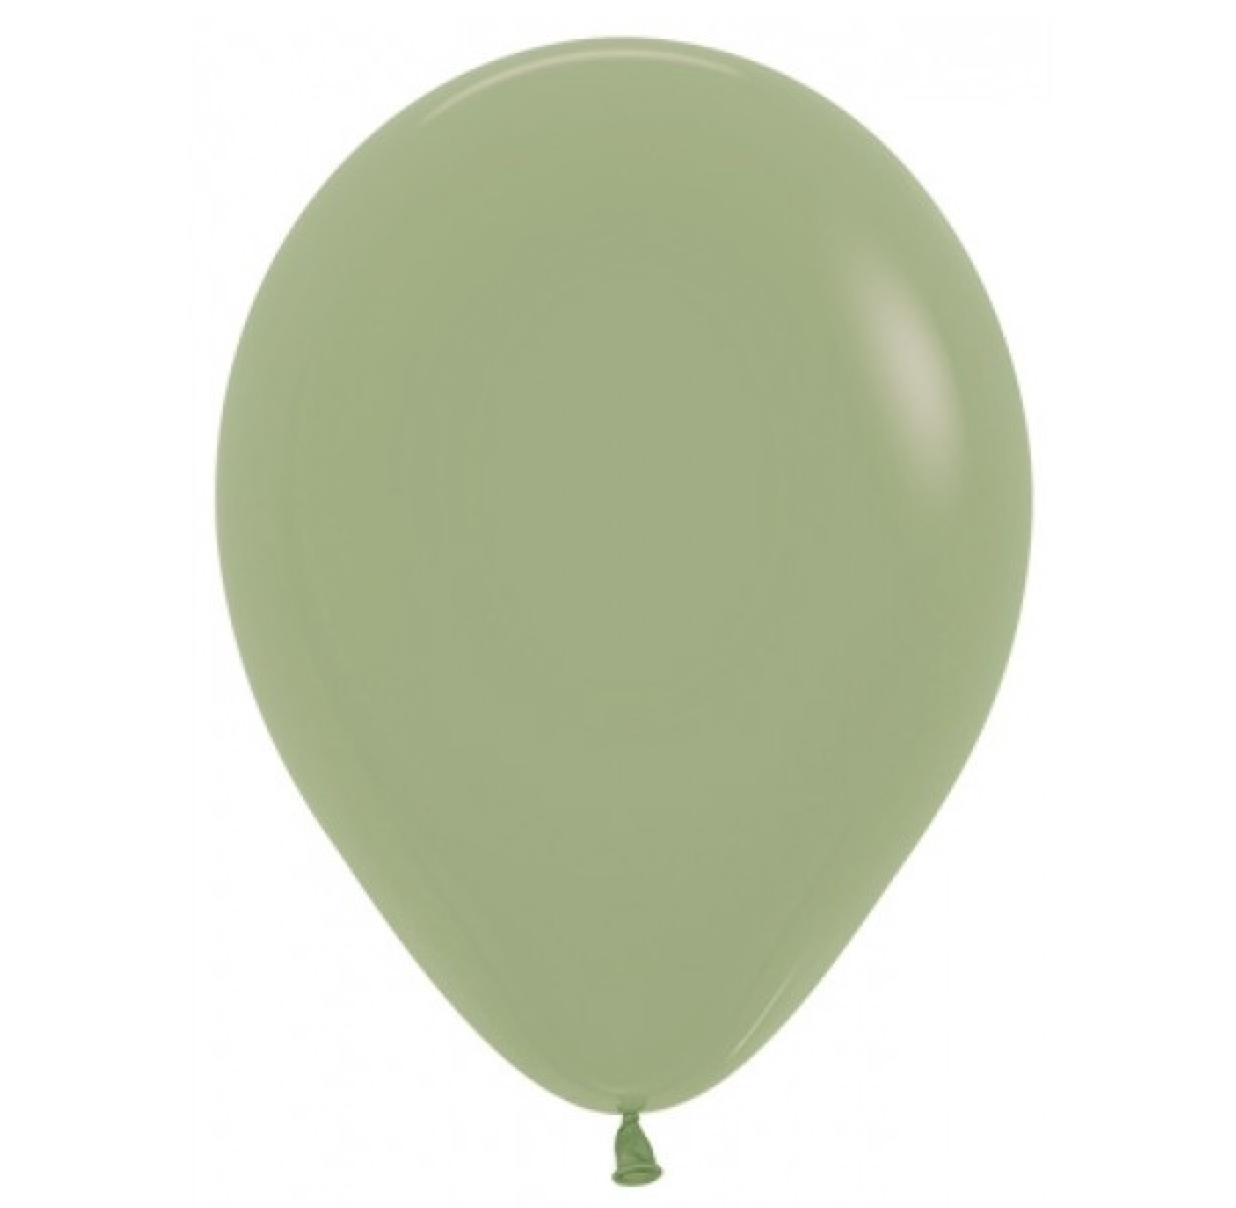 HH 5 balloons latex eucalyptus 30cm